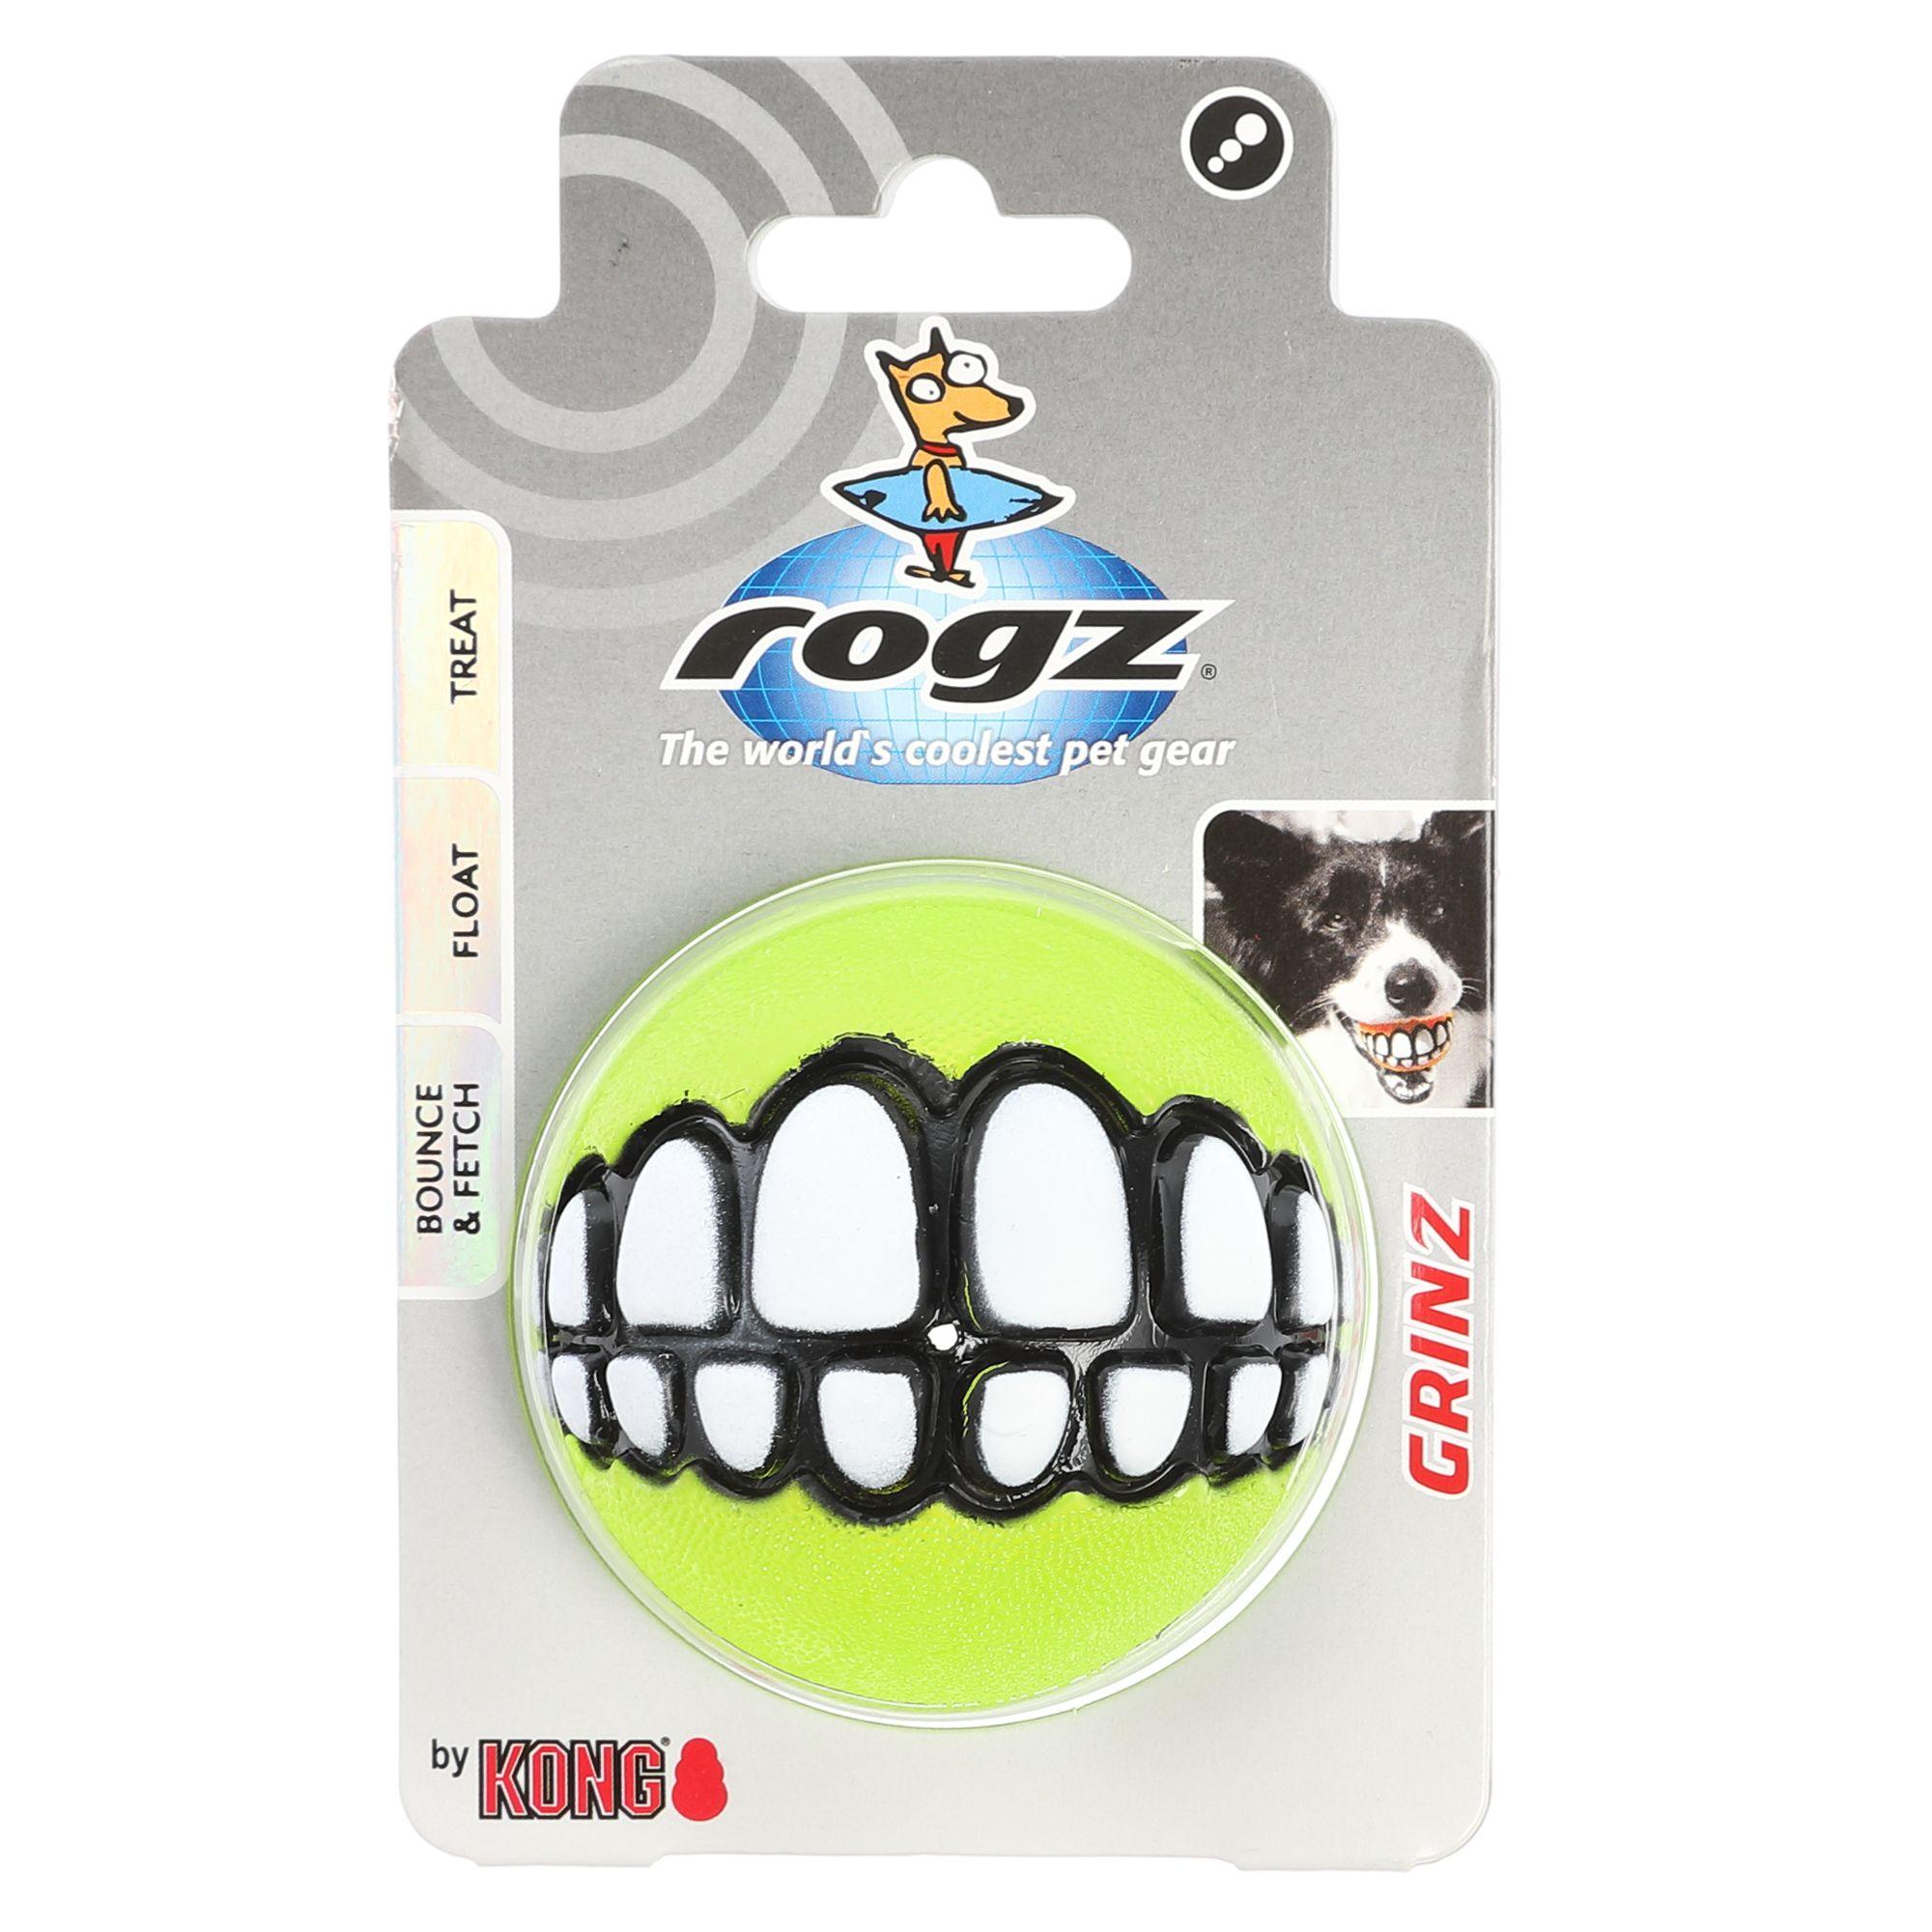 Kong rogz Grinz Dog Toy, Green 5270279